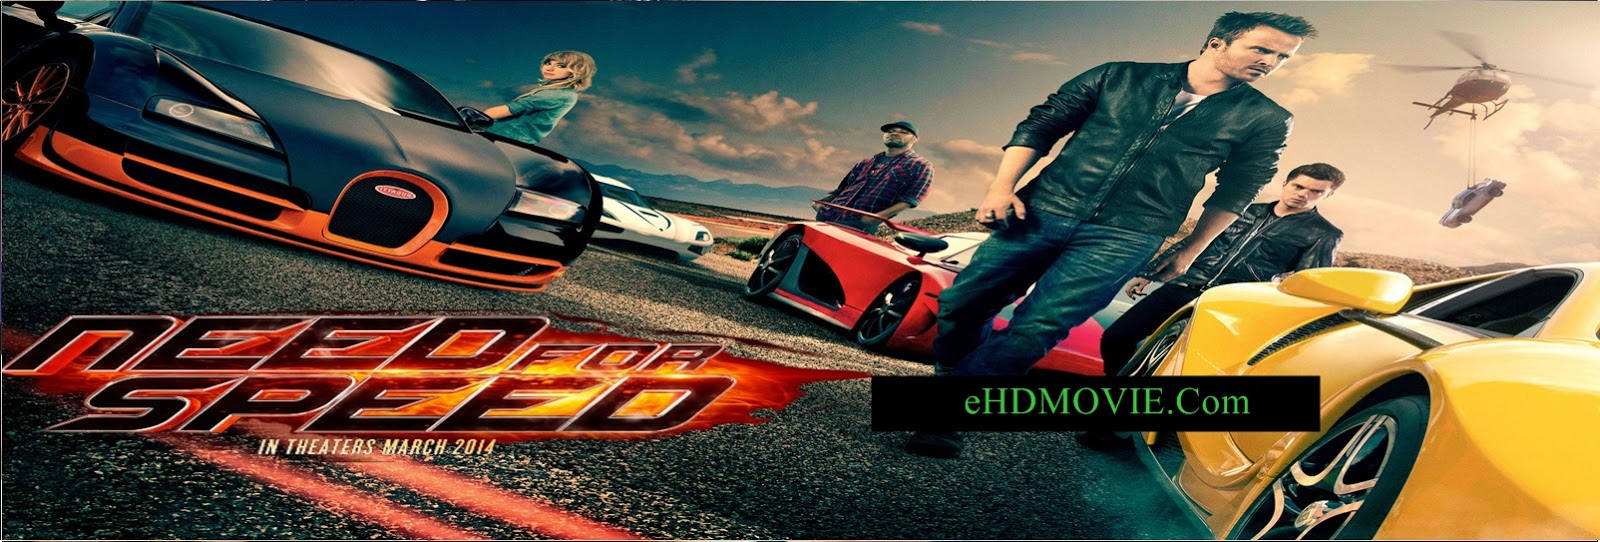 Need For Speed 2014 Full Movie Dual Audio [Hindi – English] 720p - HEVC - 480p ORG BRRip 450MB - 650MB - 1.2GB ESubs Free Download